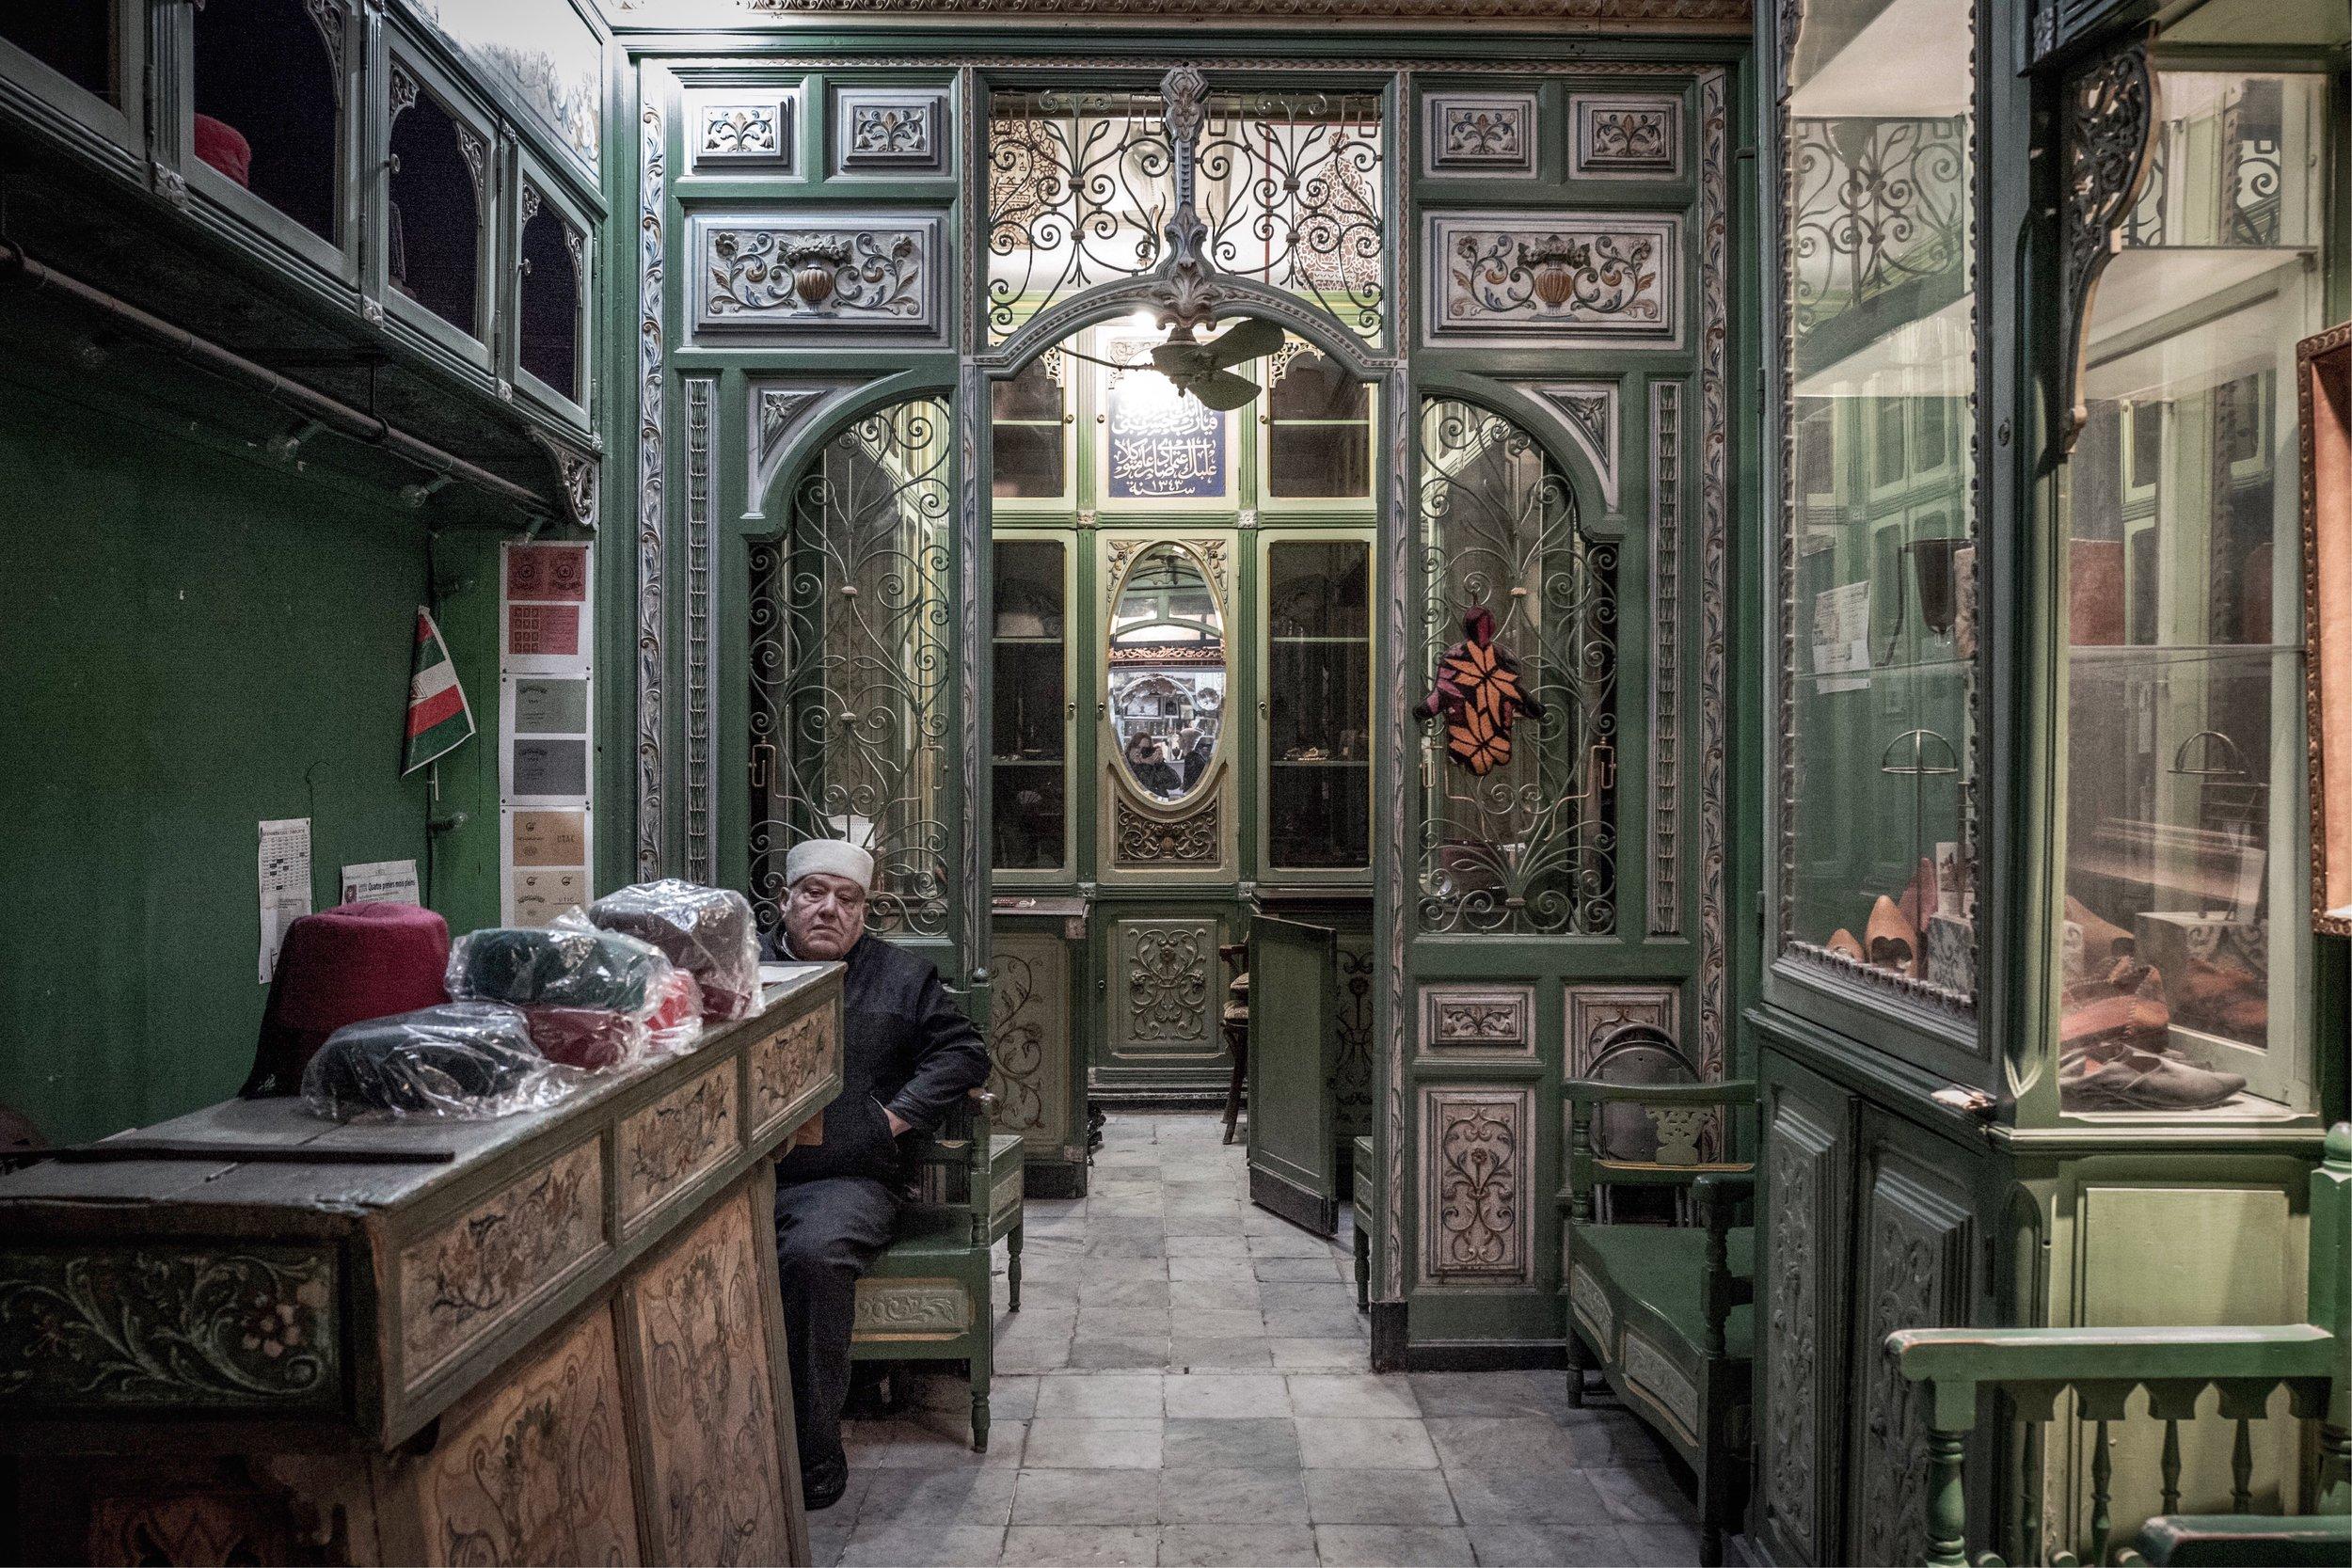 Beautiful historic shop interior in Medina de Tunis.